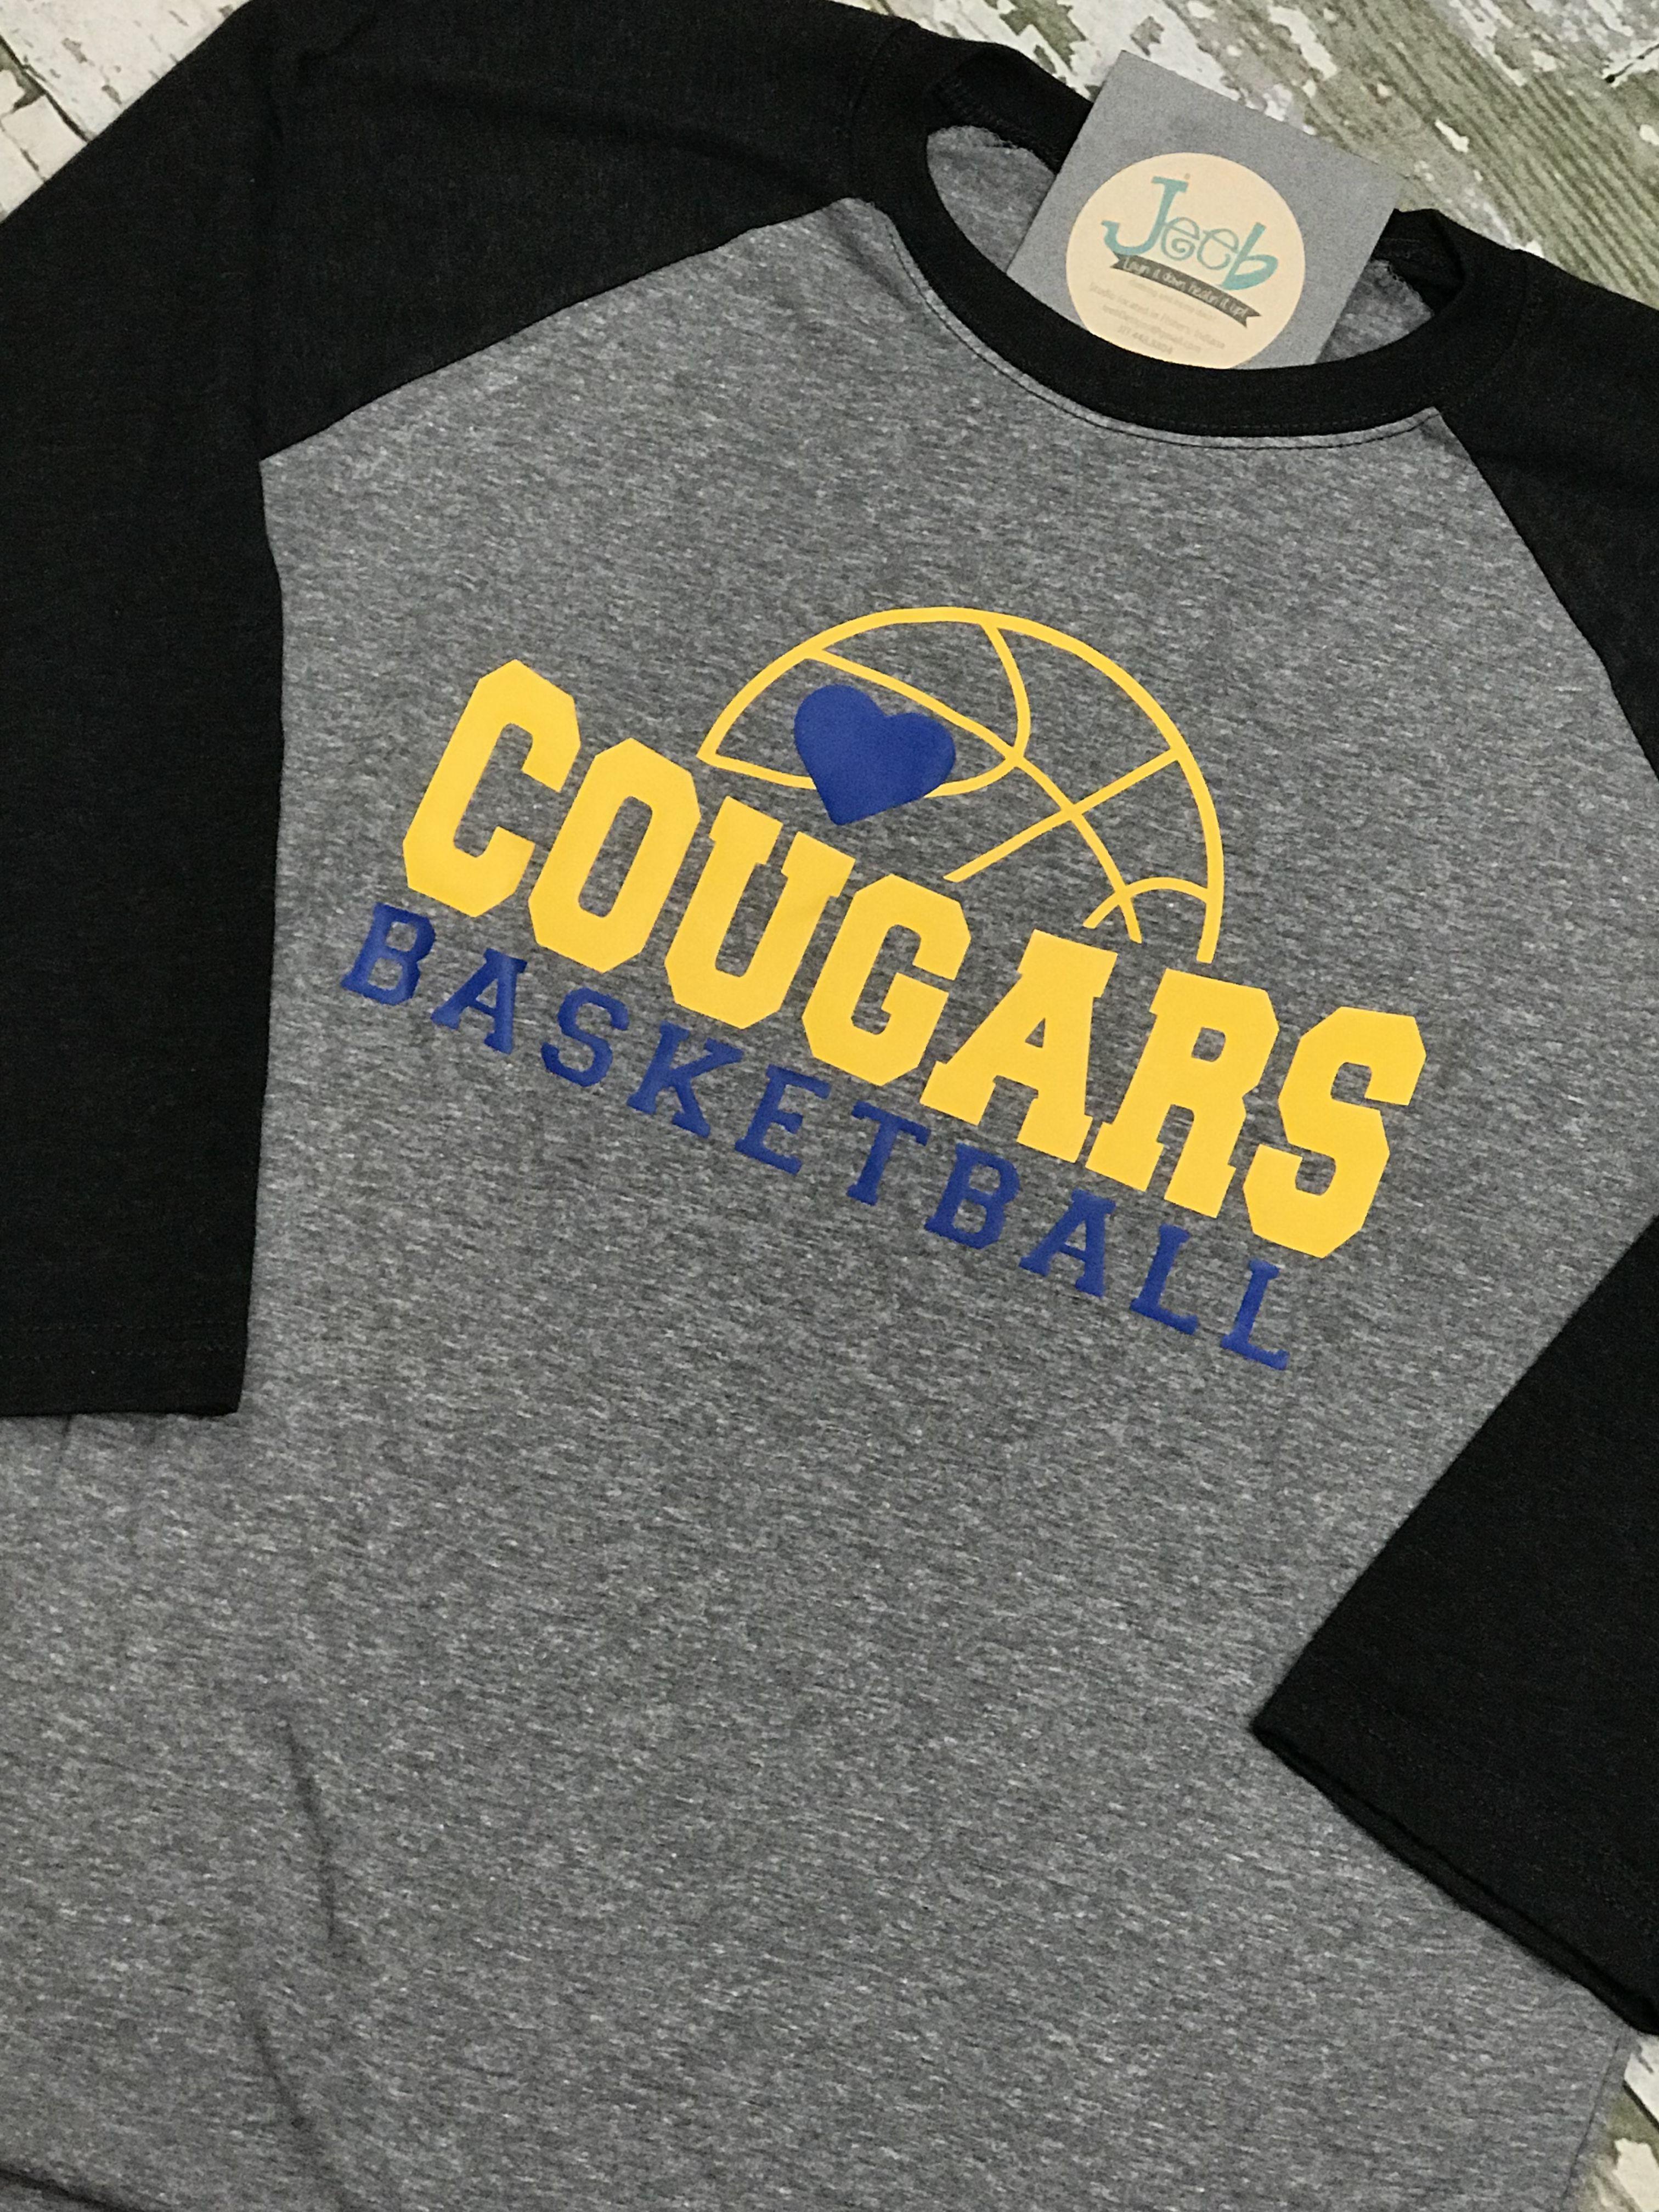 Jeeb Designs Llc In Fishers Indiana Order Today At Jeebdesignorders Gmail Com Facebook Jeeb Basketball Mom Shirts Basketball Shirt Designs Basketball Shirts